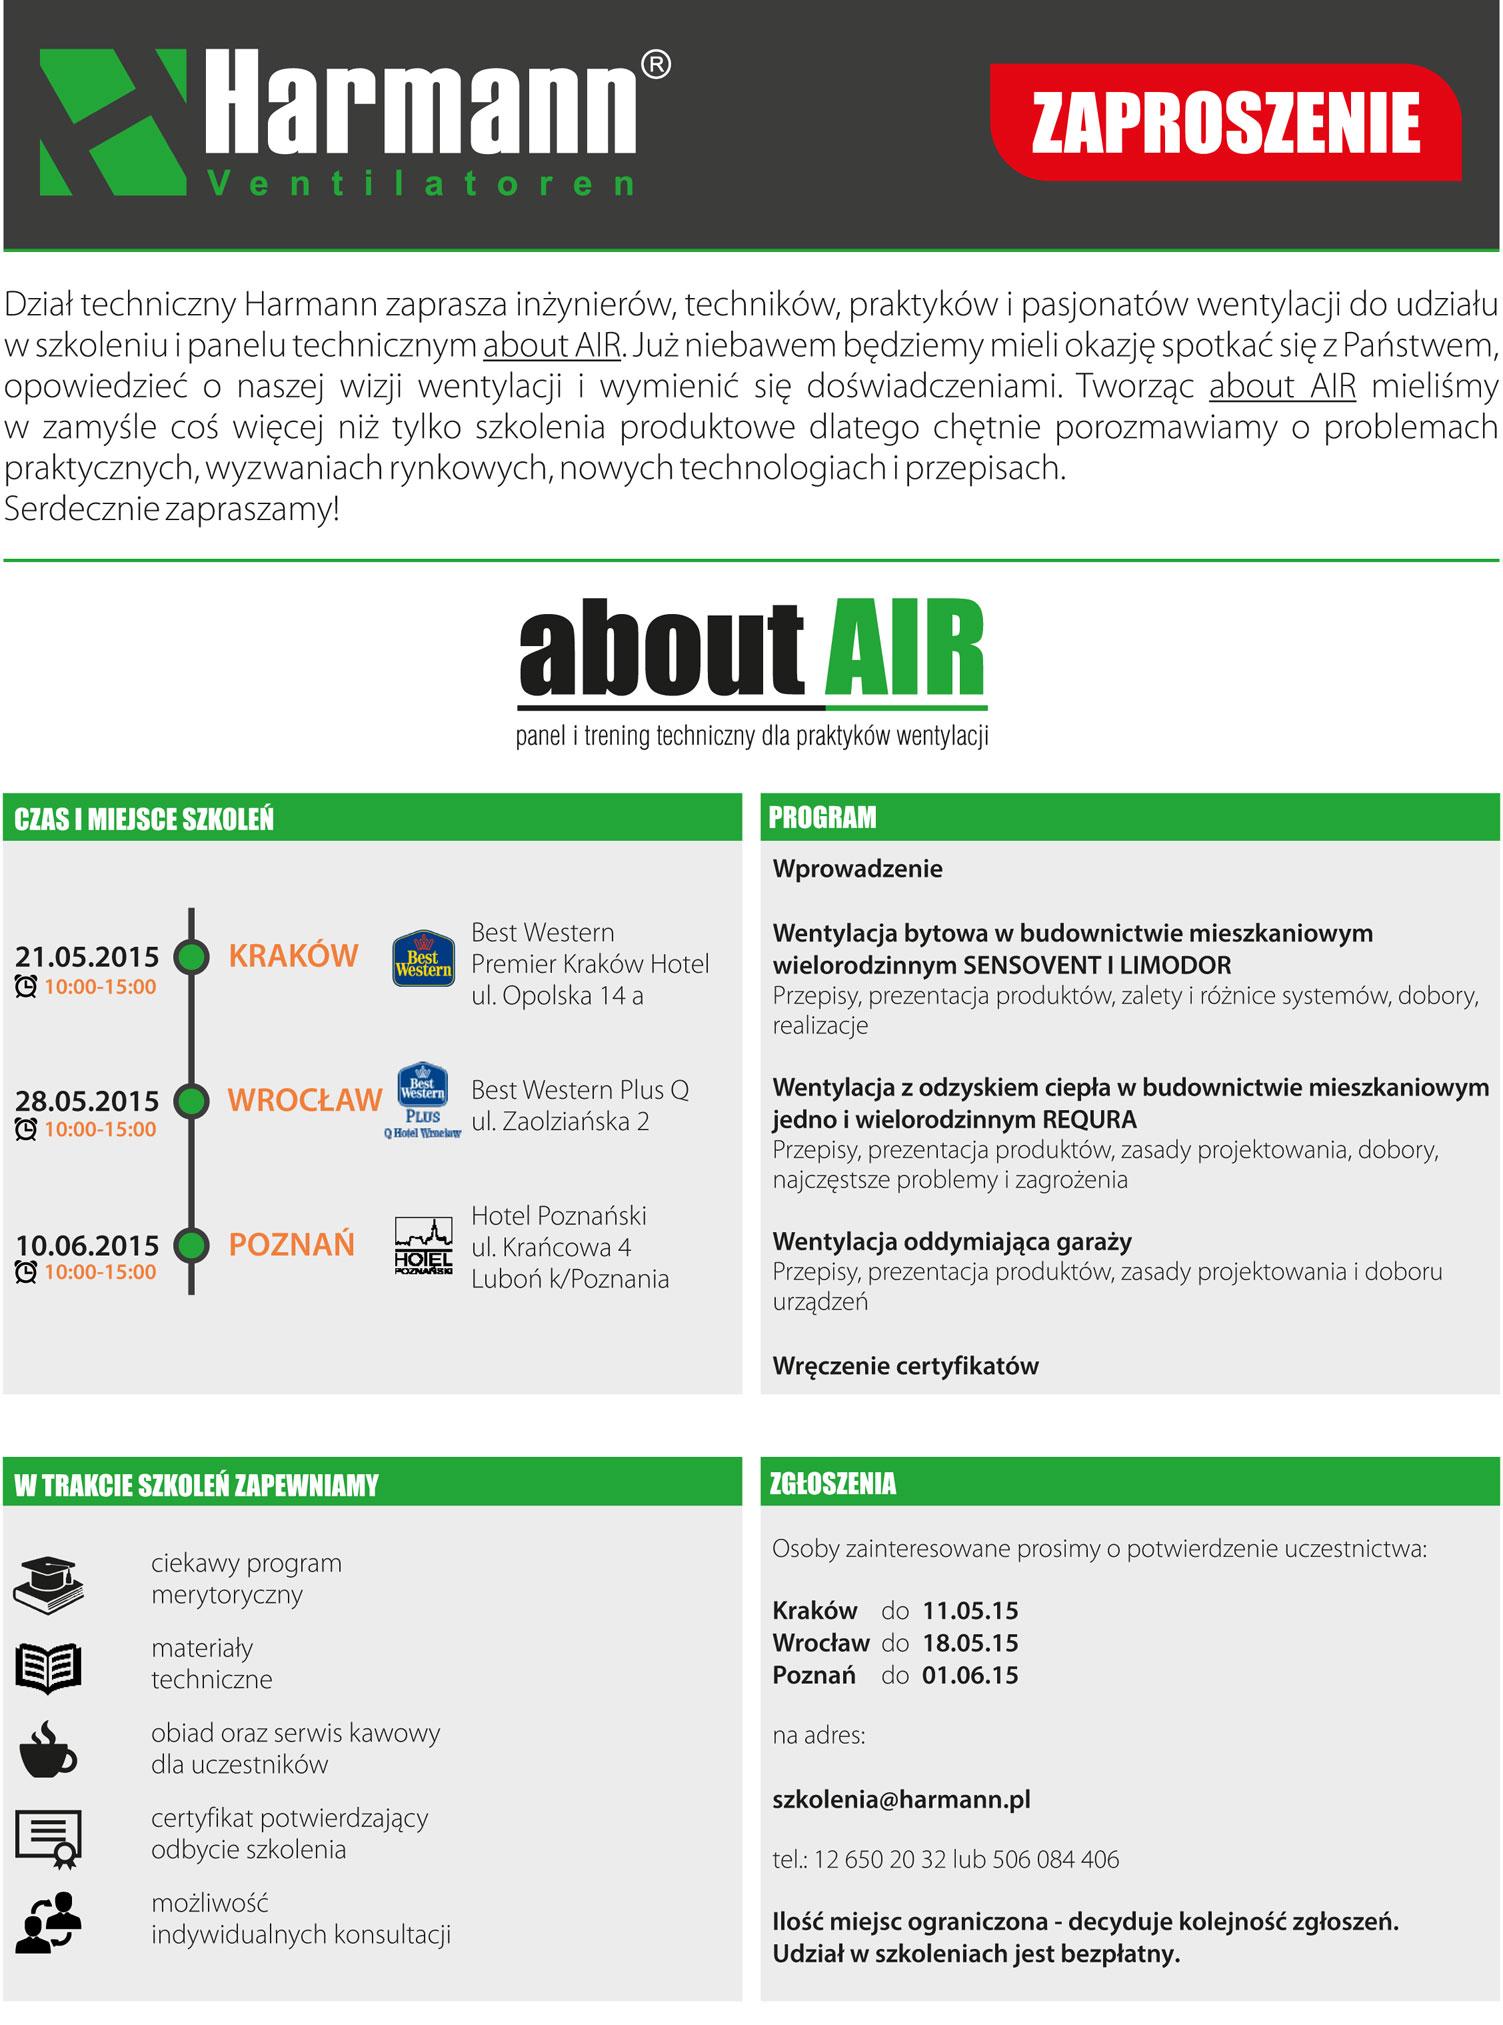 Szkolenia Harmann about AIR 2015